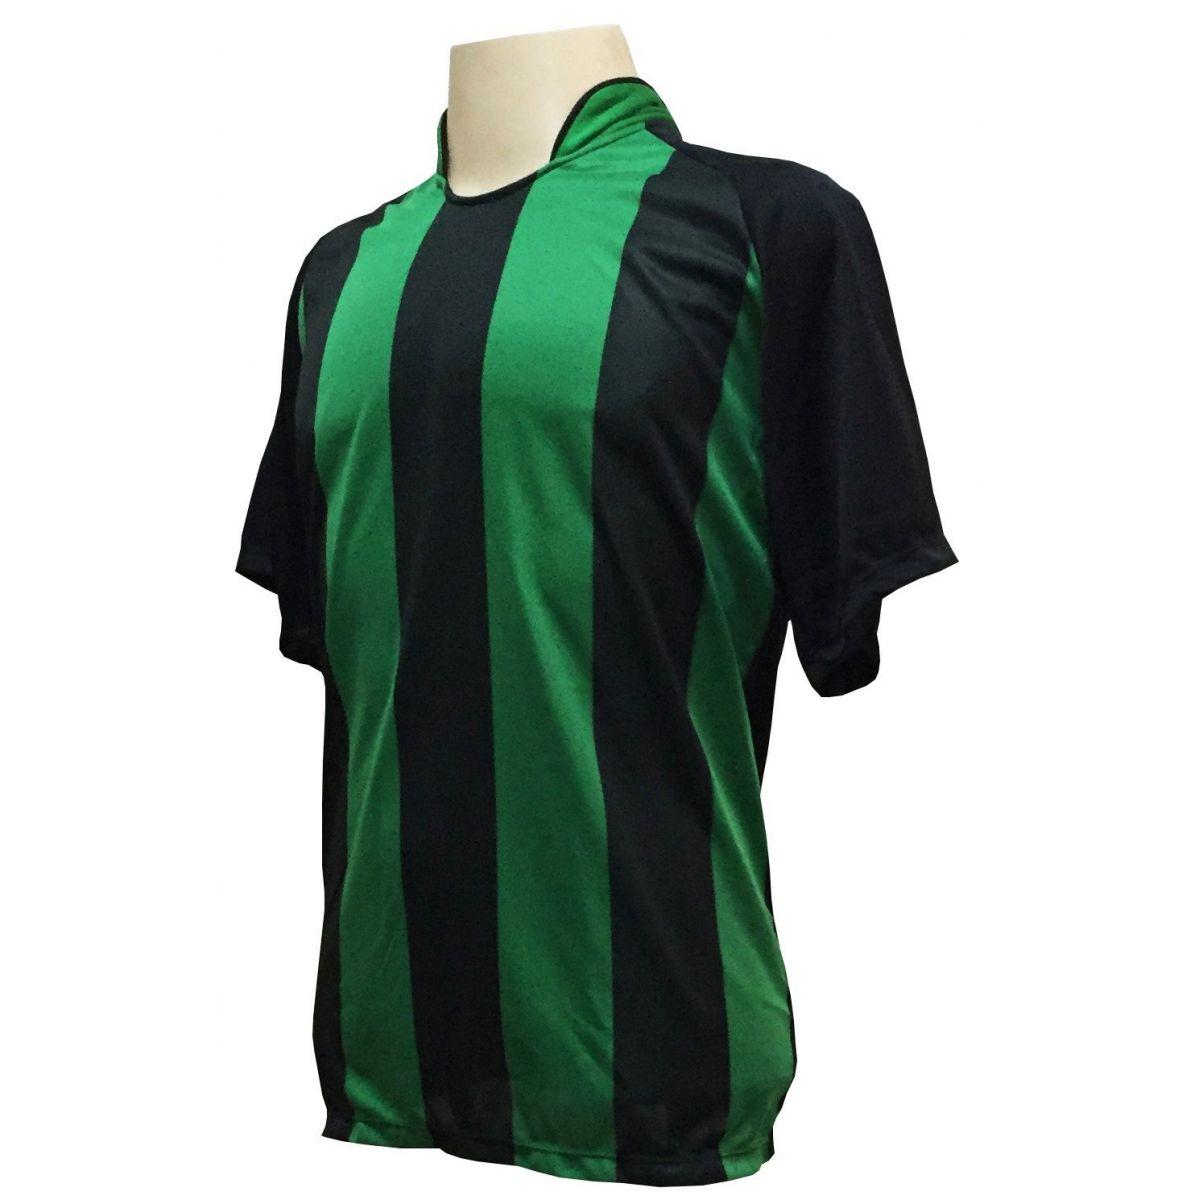 Jogo de Camisa com 20 unidades modelo Milan Preto/Verde + Brindes